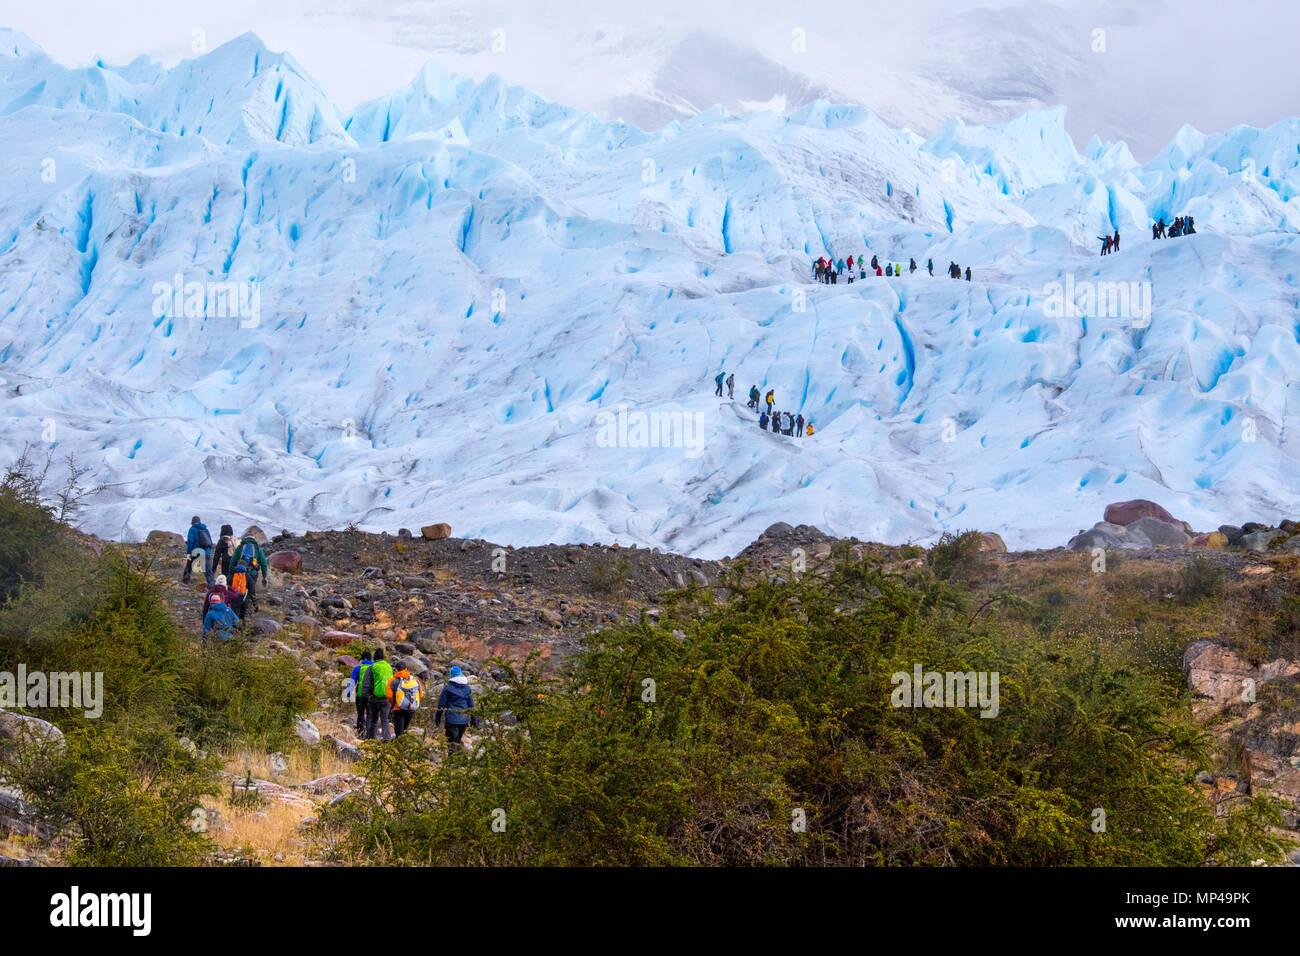 Touren Wandern auf den Gletscher Perito Moreno, Parque Nacional Los Glaciares, Argentinien Stockbild